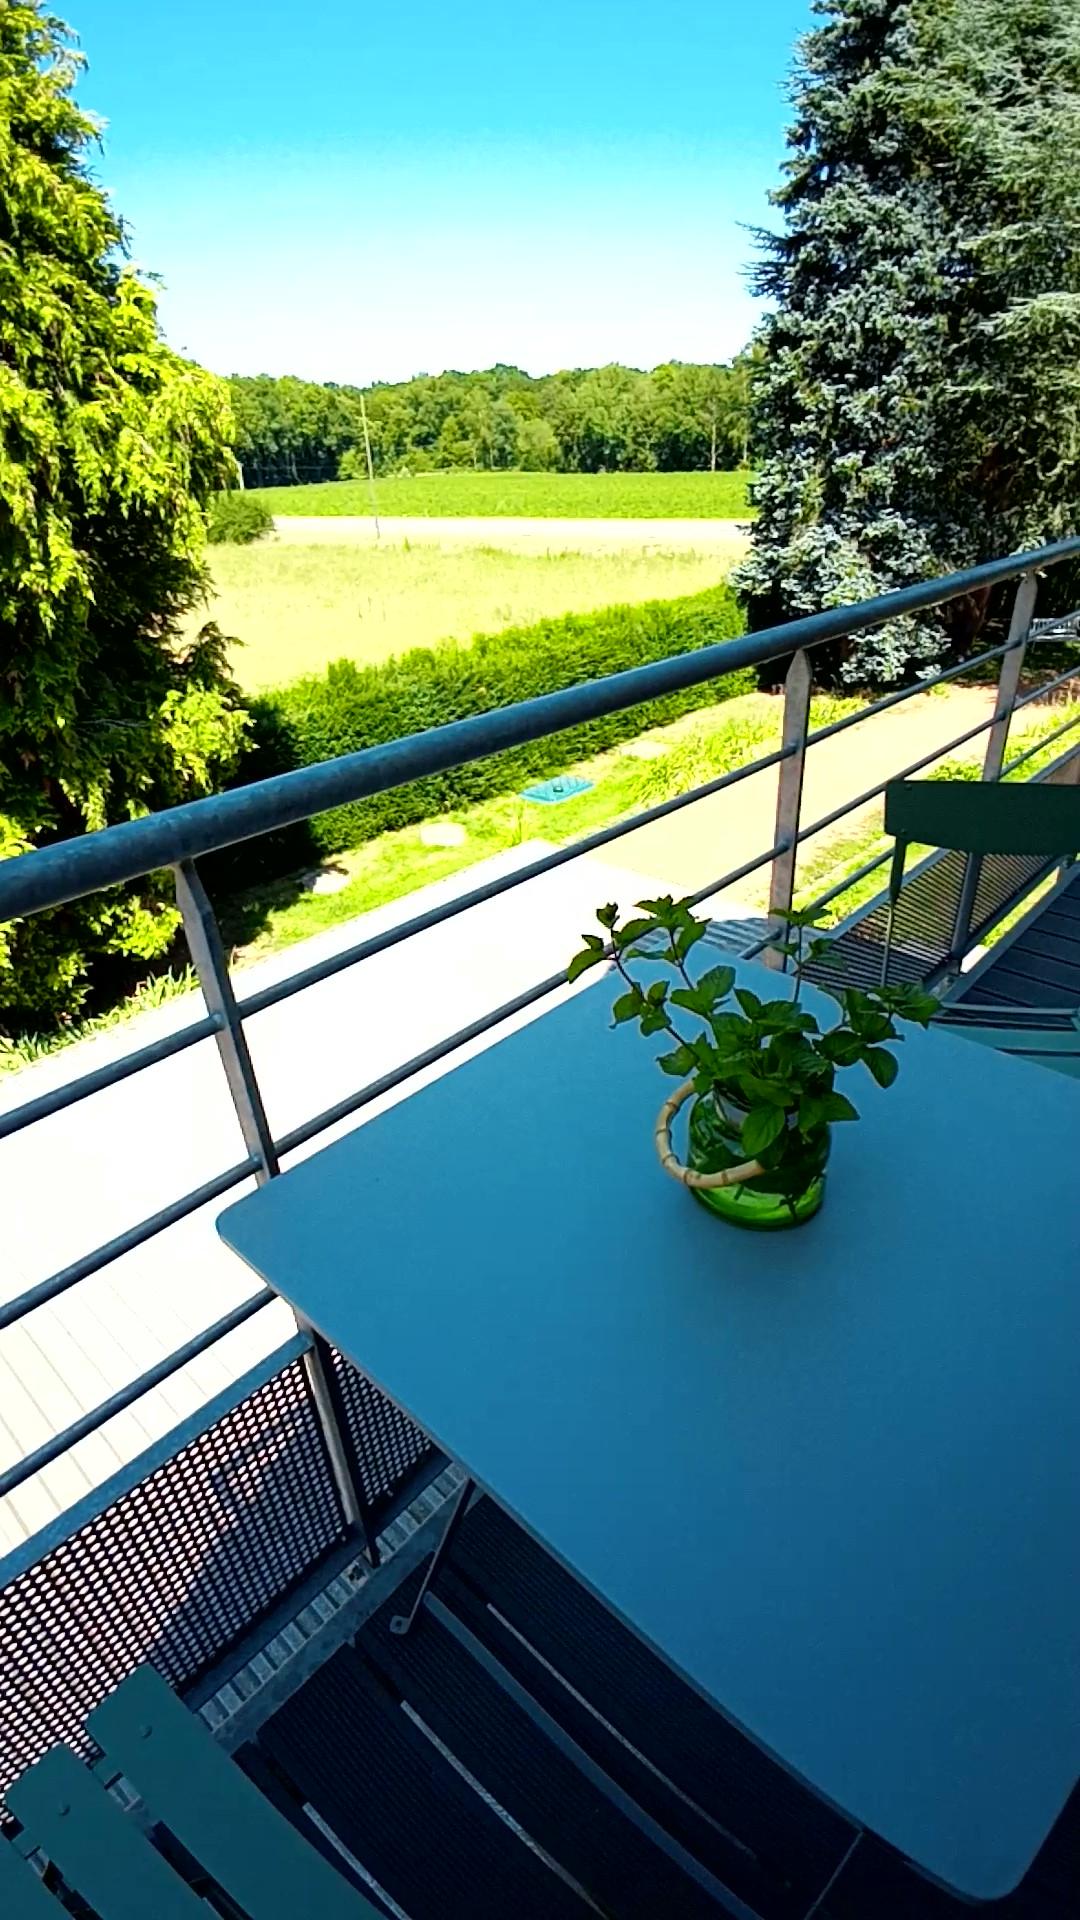 balcon vue paysage